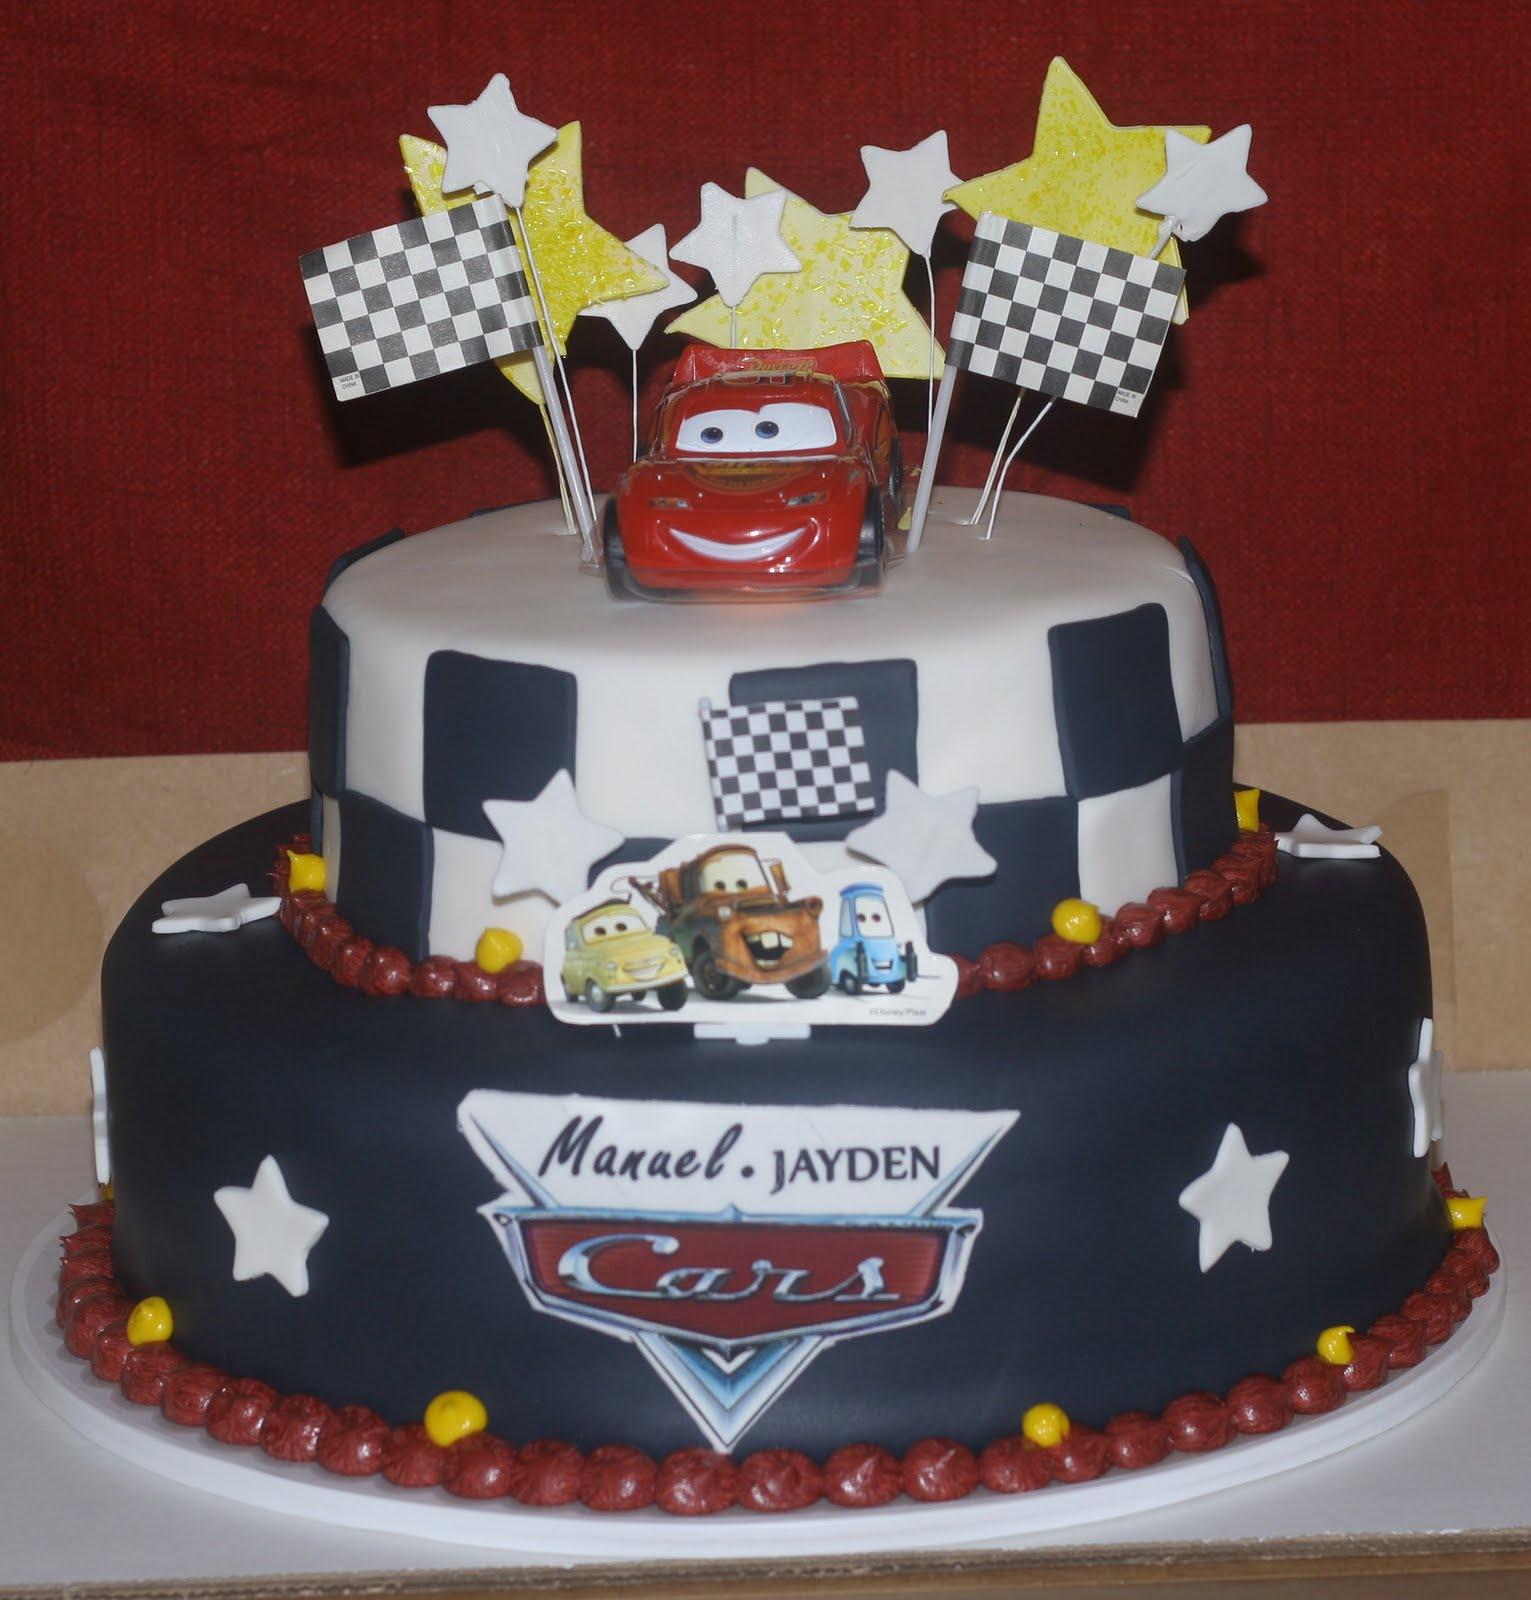 Hector's Custom Cakes: Disney's Cars Themed Cake